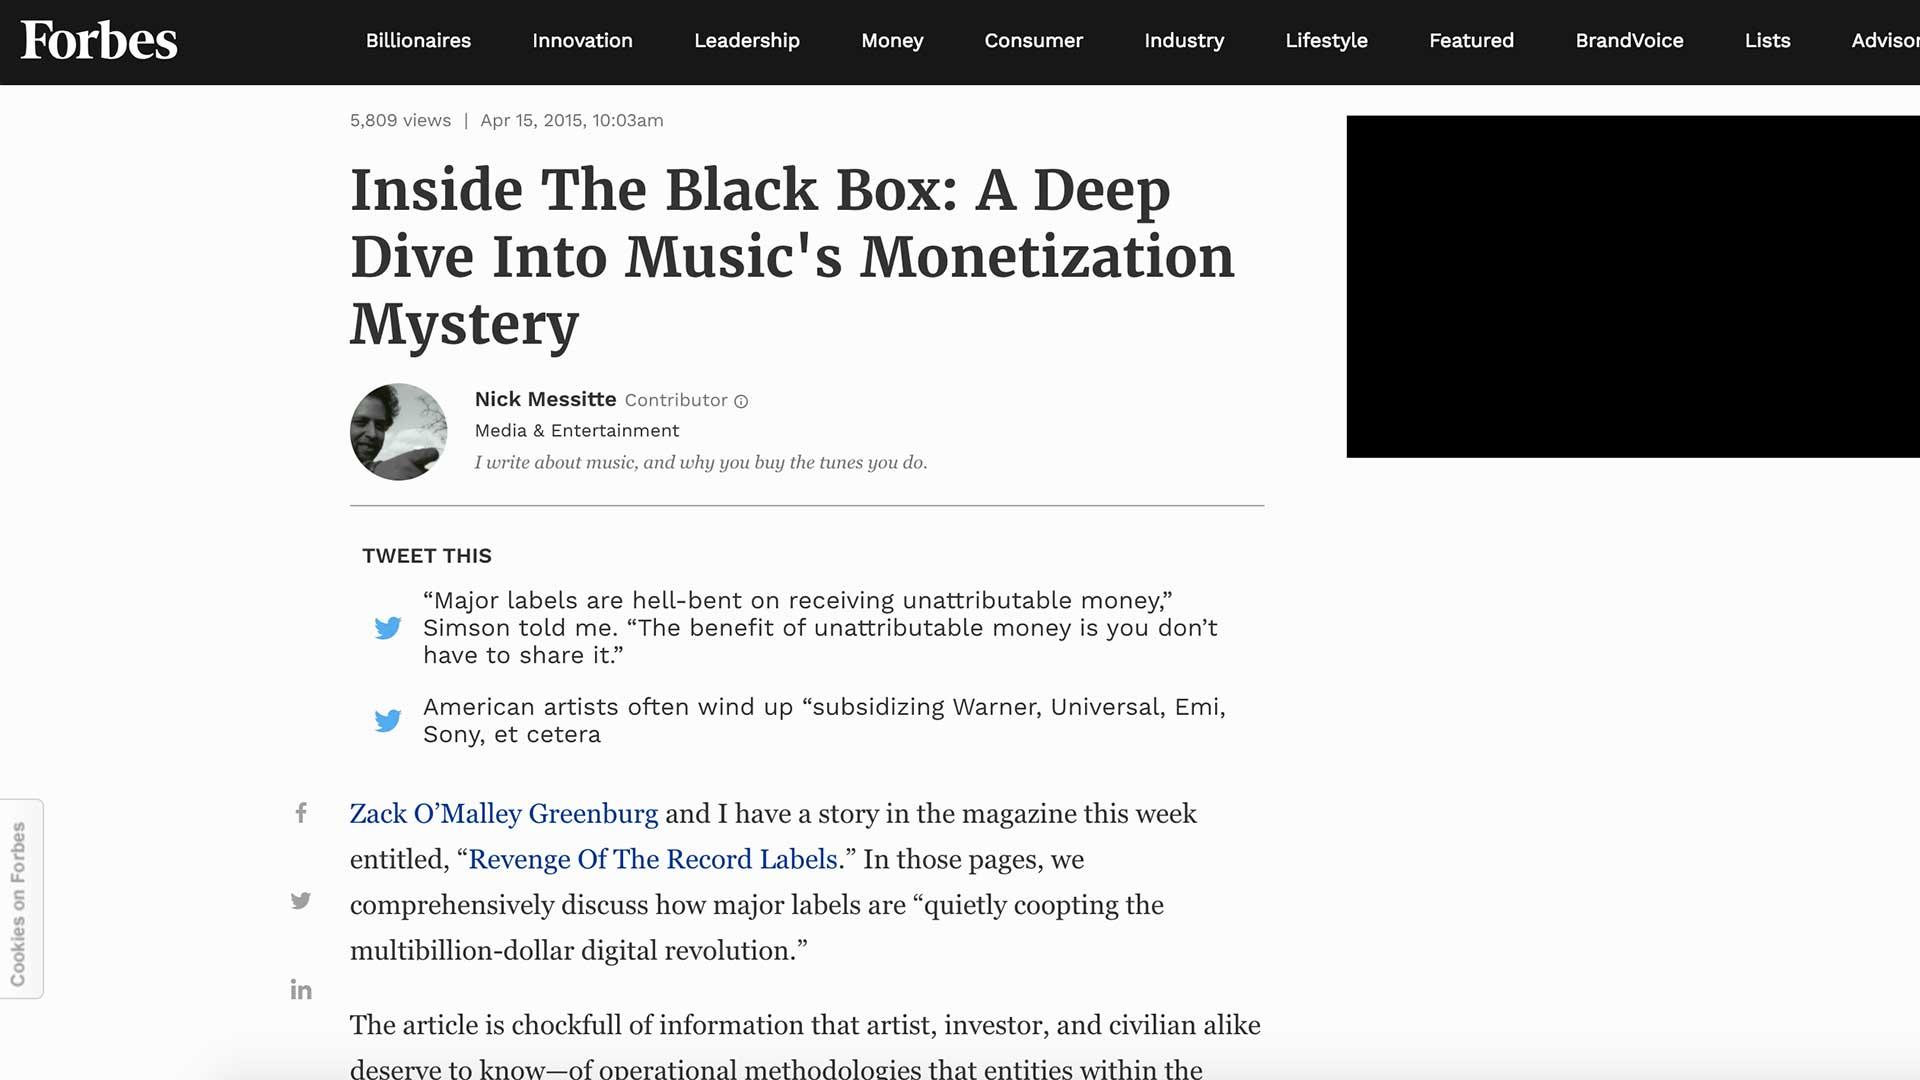 Fairness Rocks News Inside The Black Box: A Deep Dive Into Music's Monetization Mystery